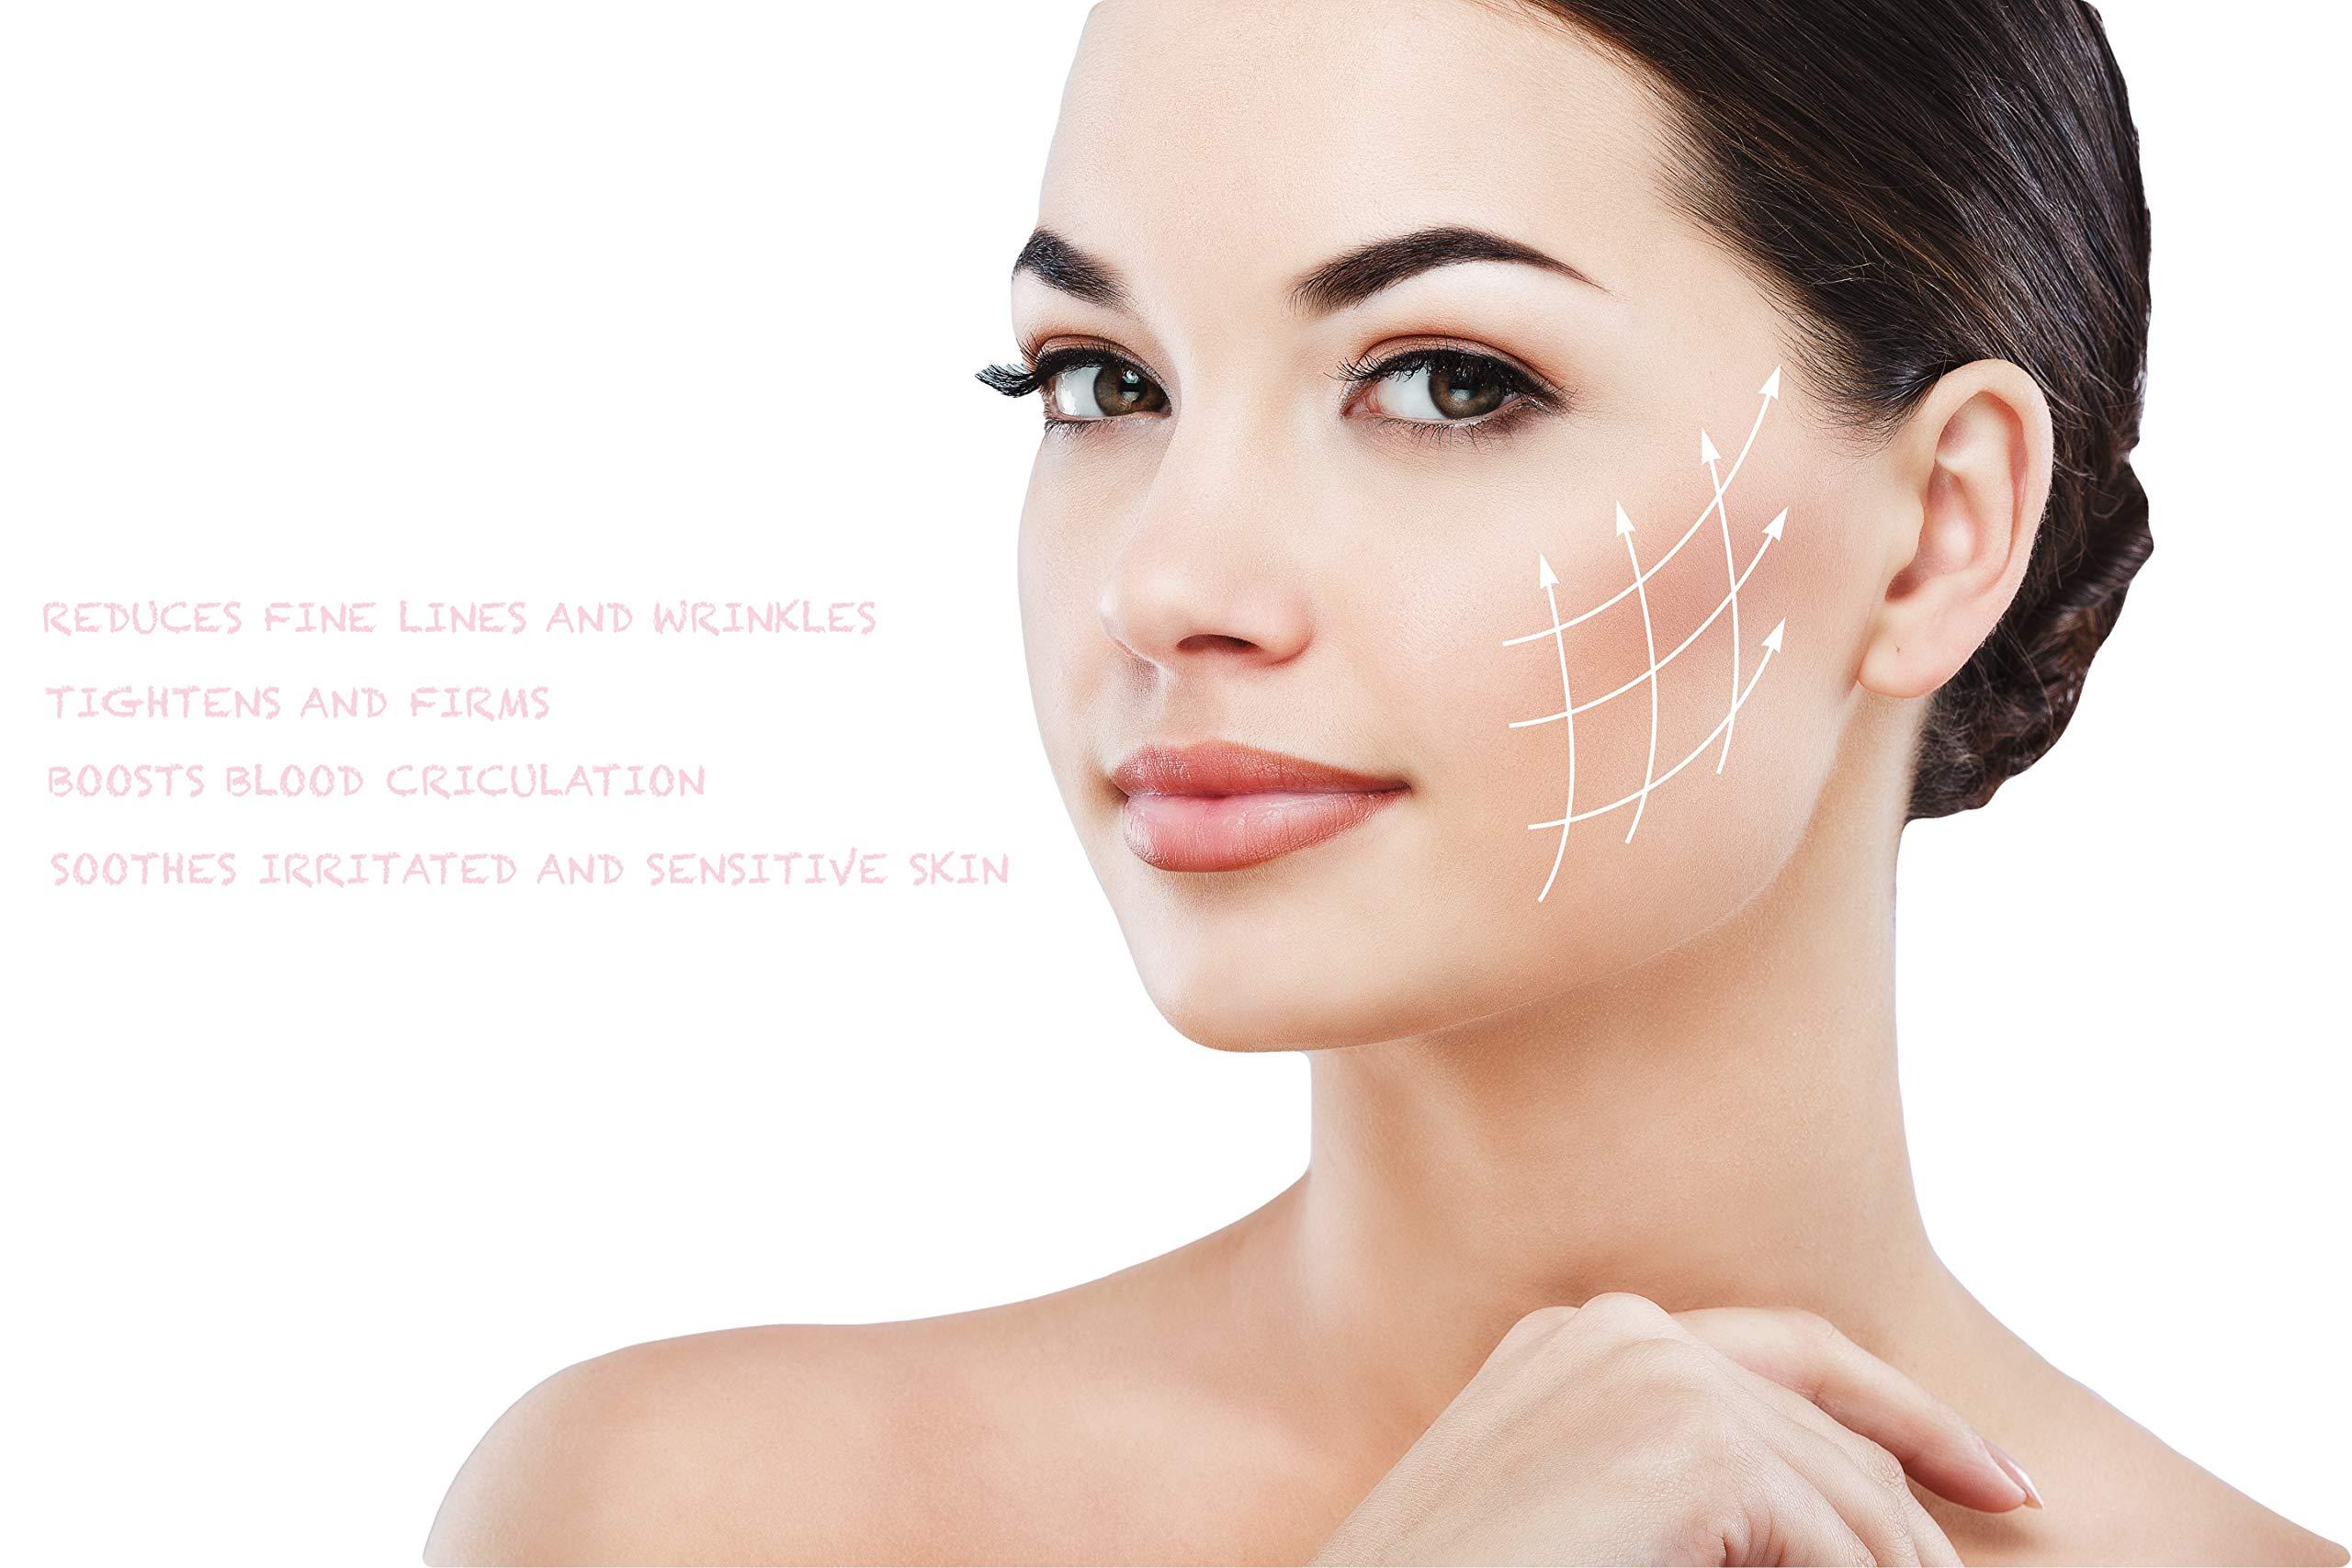 Natural Rose Quartz Facial Massage Jade Roller for Face Neck Eye Body in  Rose Gold  Anti-aging Anti Wrinkle Slimming Healing Rejuvenation & Beauty